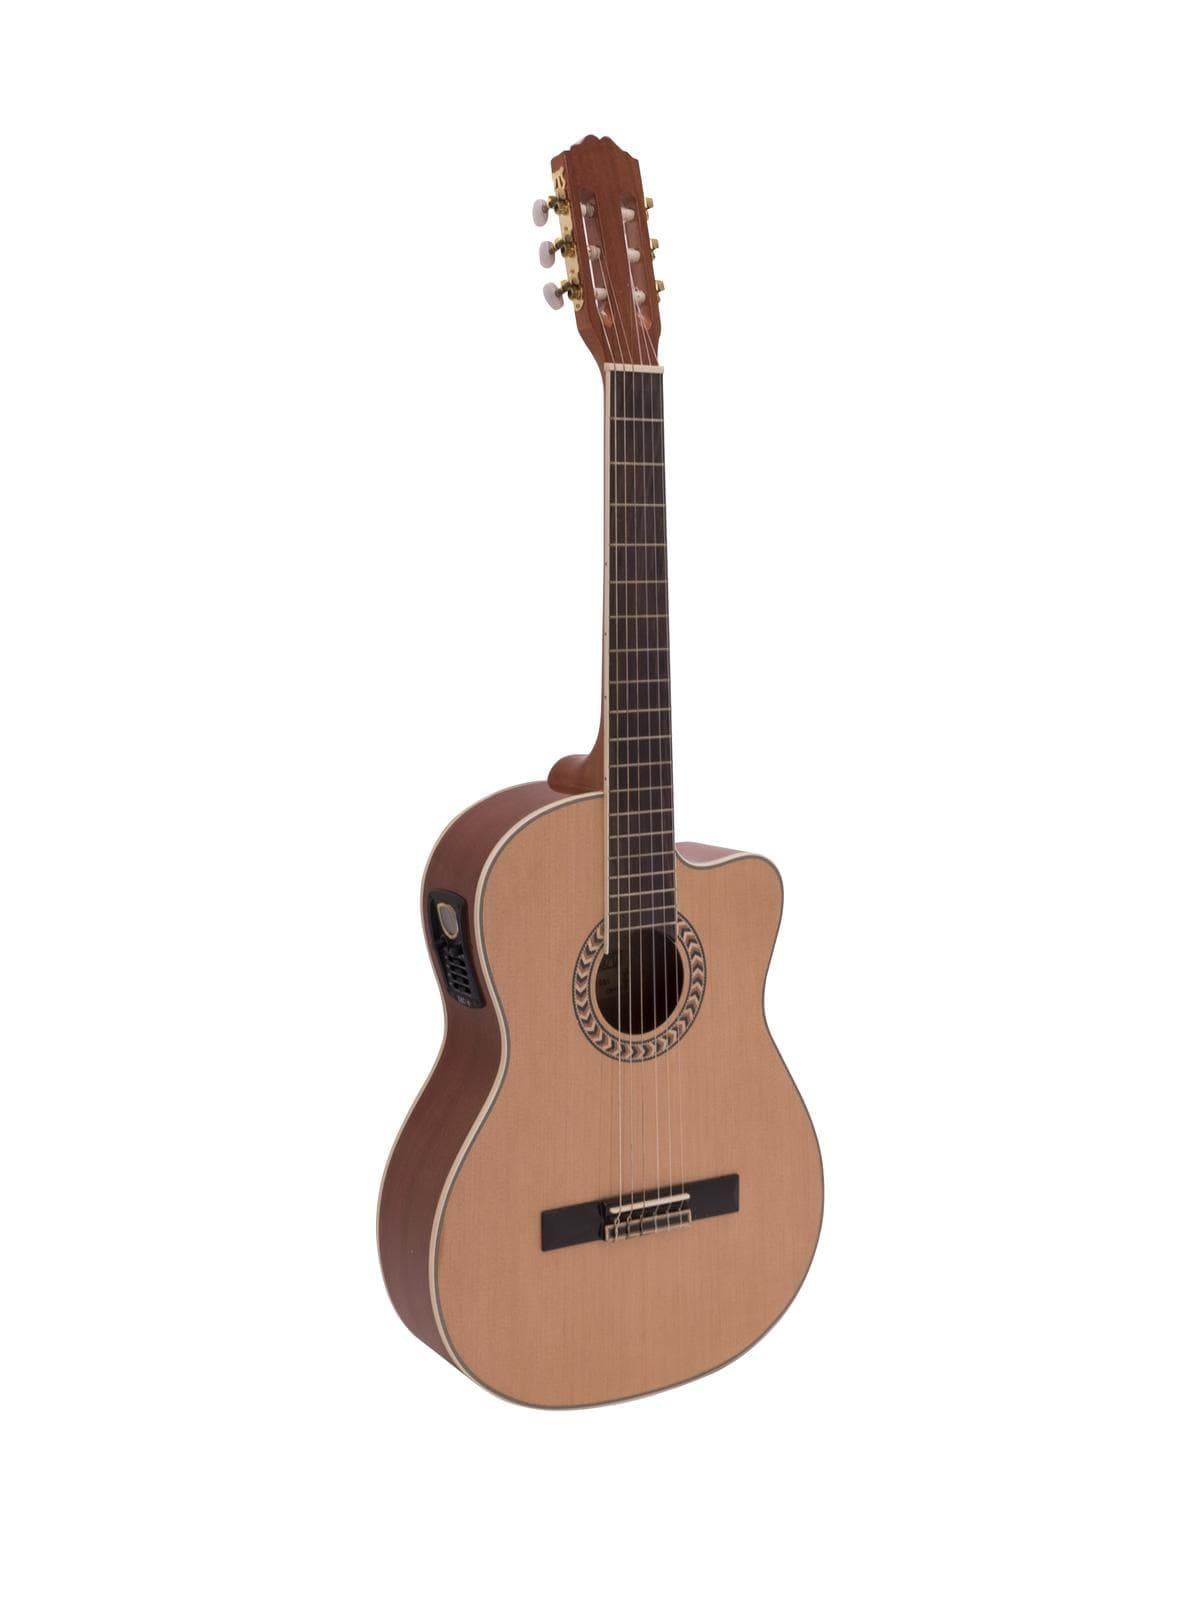 DIMAVERY CN-600 Classic guitar, nature